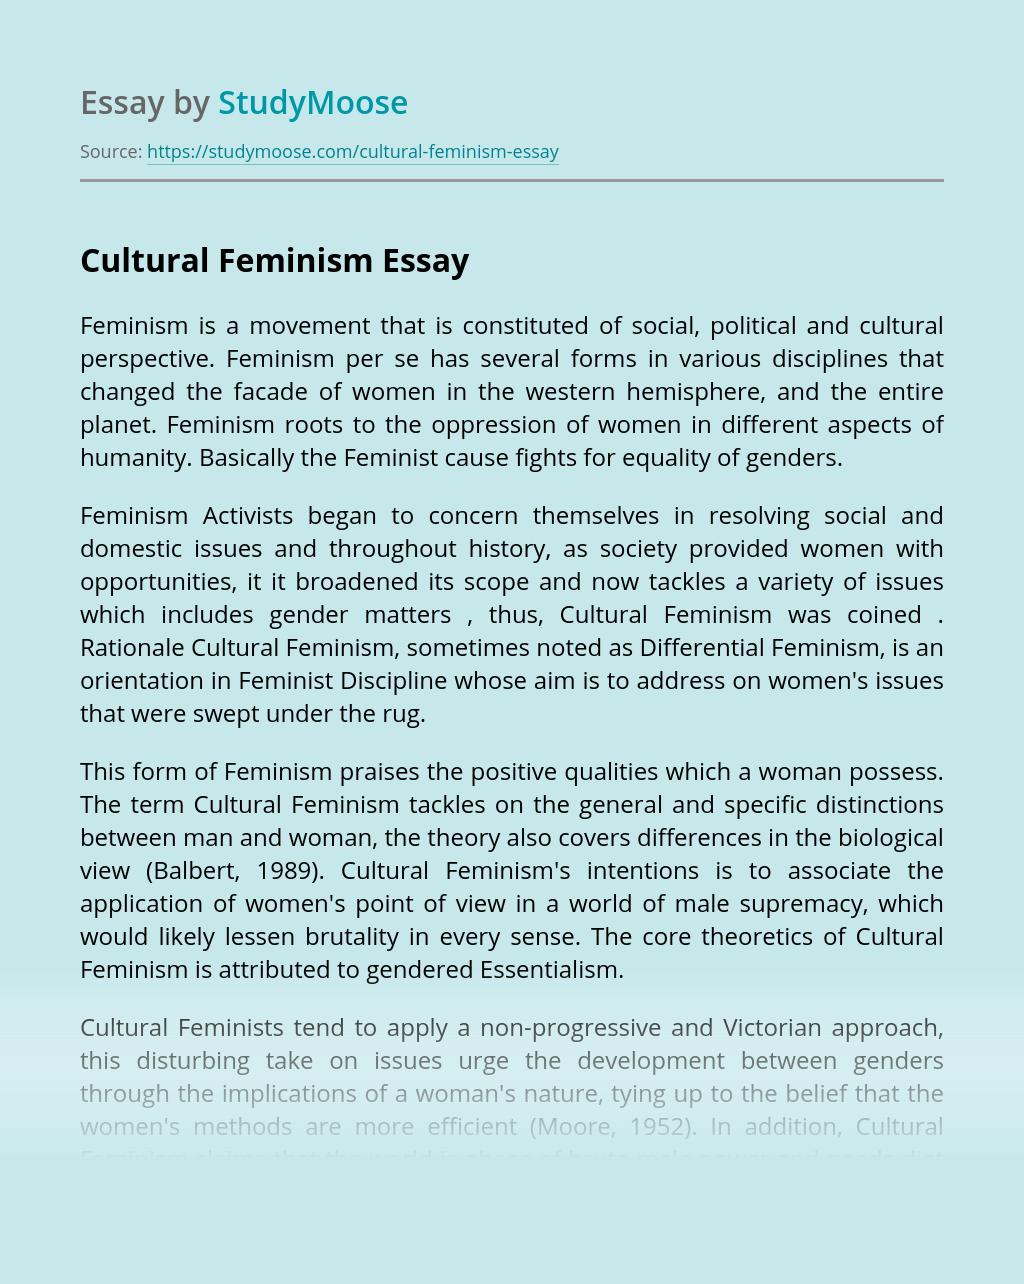 Cultural Feminism